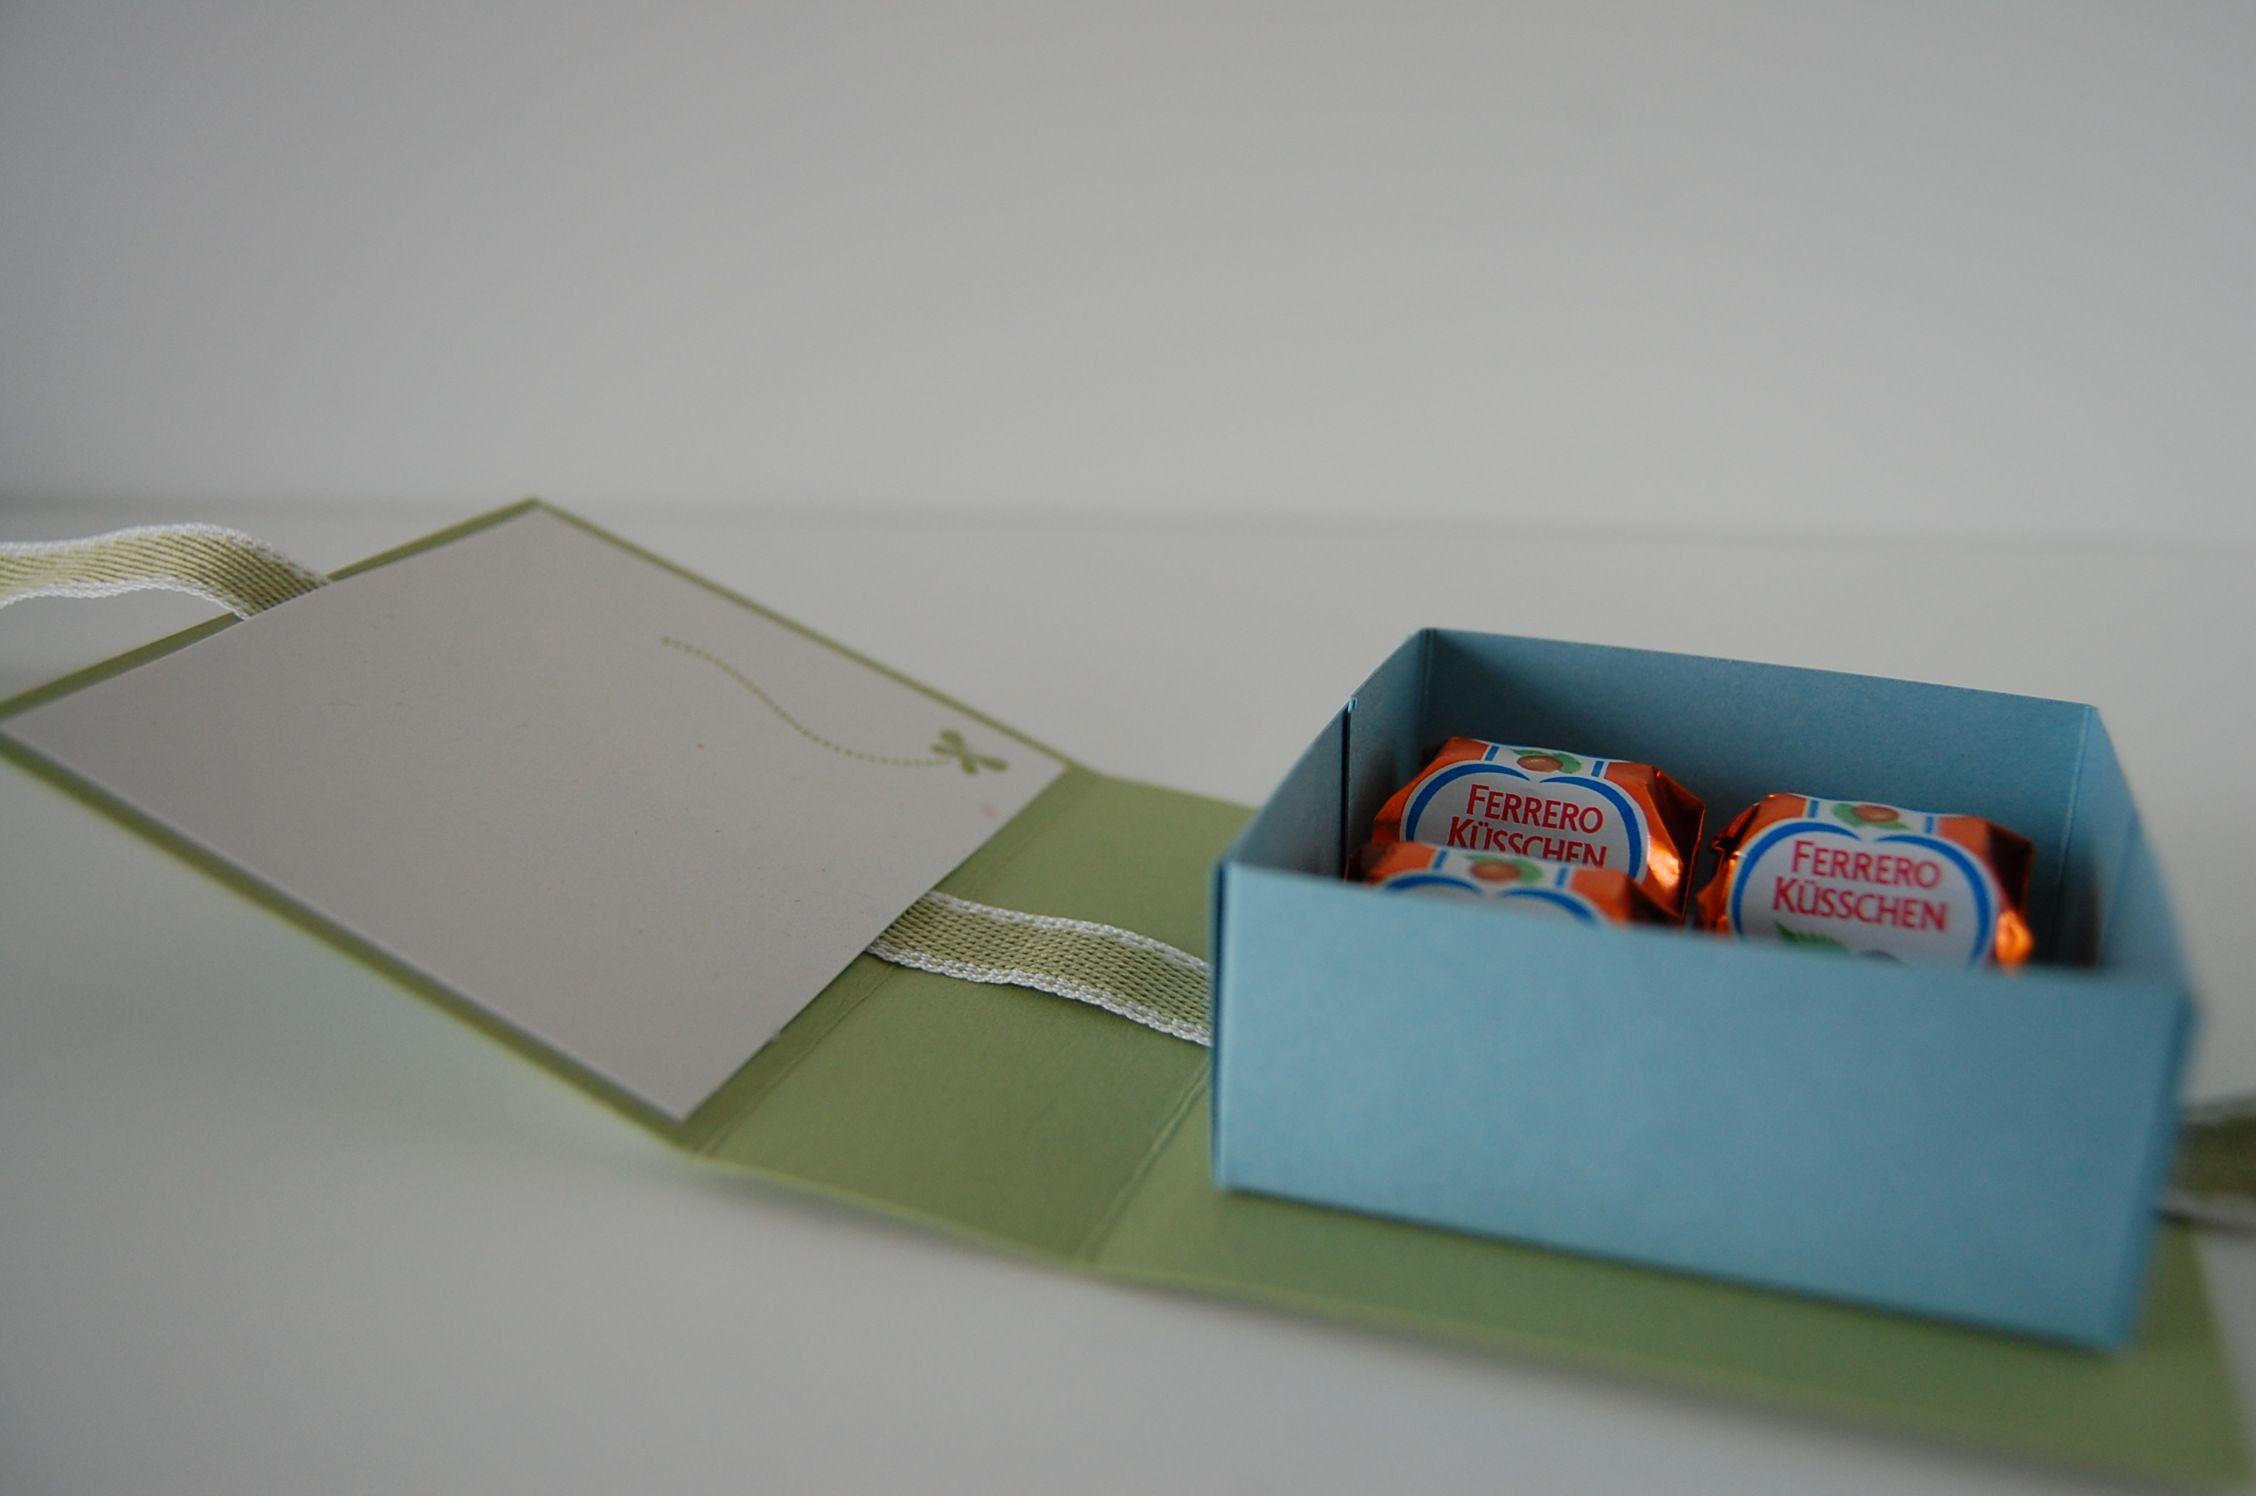 kleine verpackung in buchform geschenk verpackung pinterest einfache verpackung botschaft. Black Bedroom Furniture Sets. Home Design Ideas